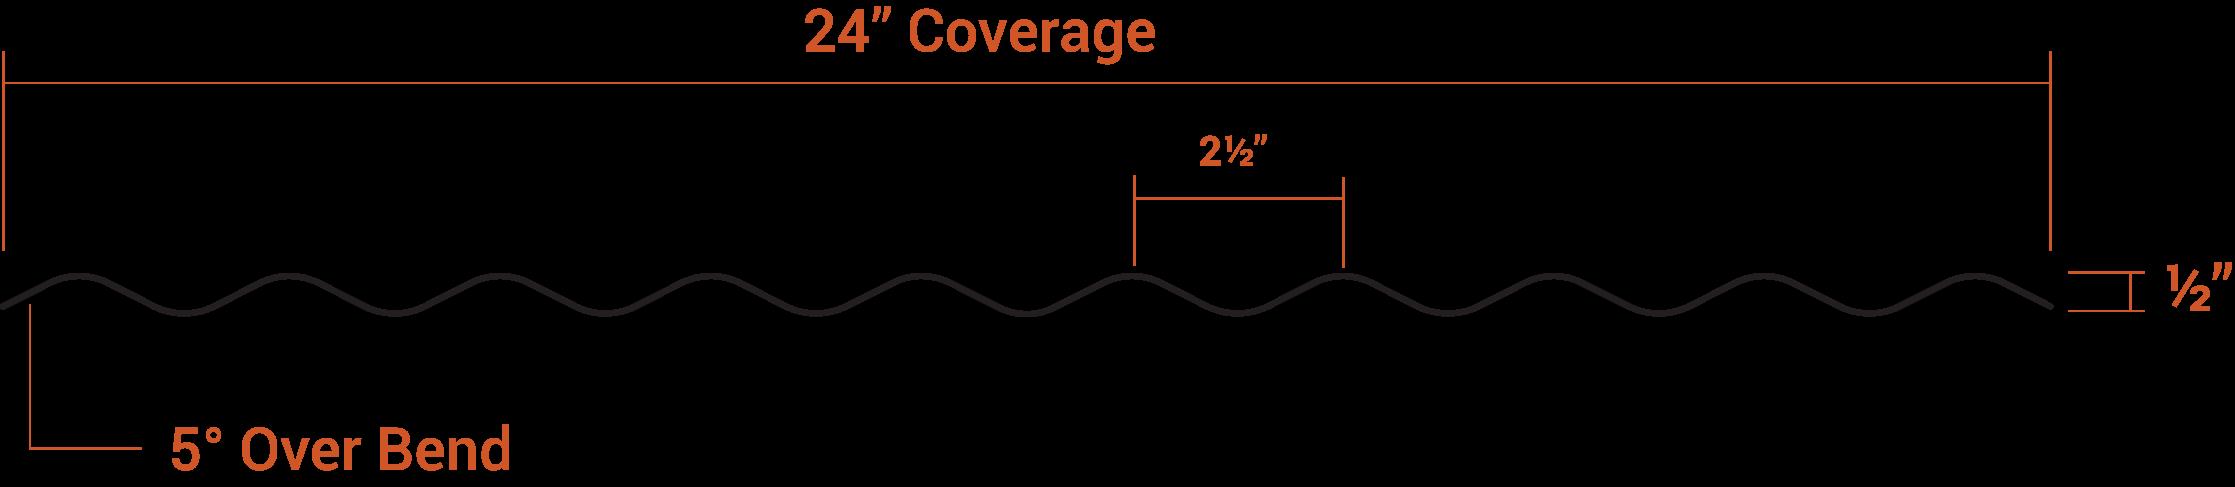 "1/2"" Corrugated Panel Profile"